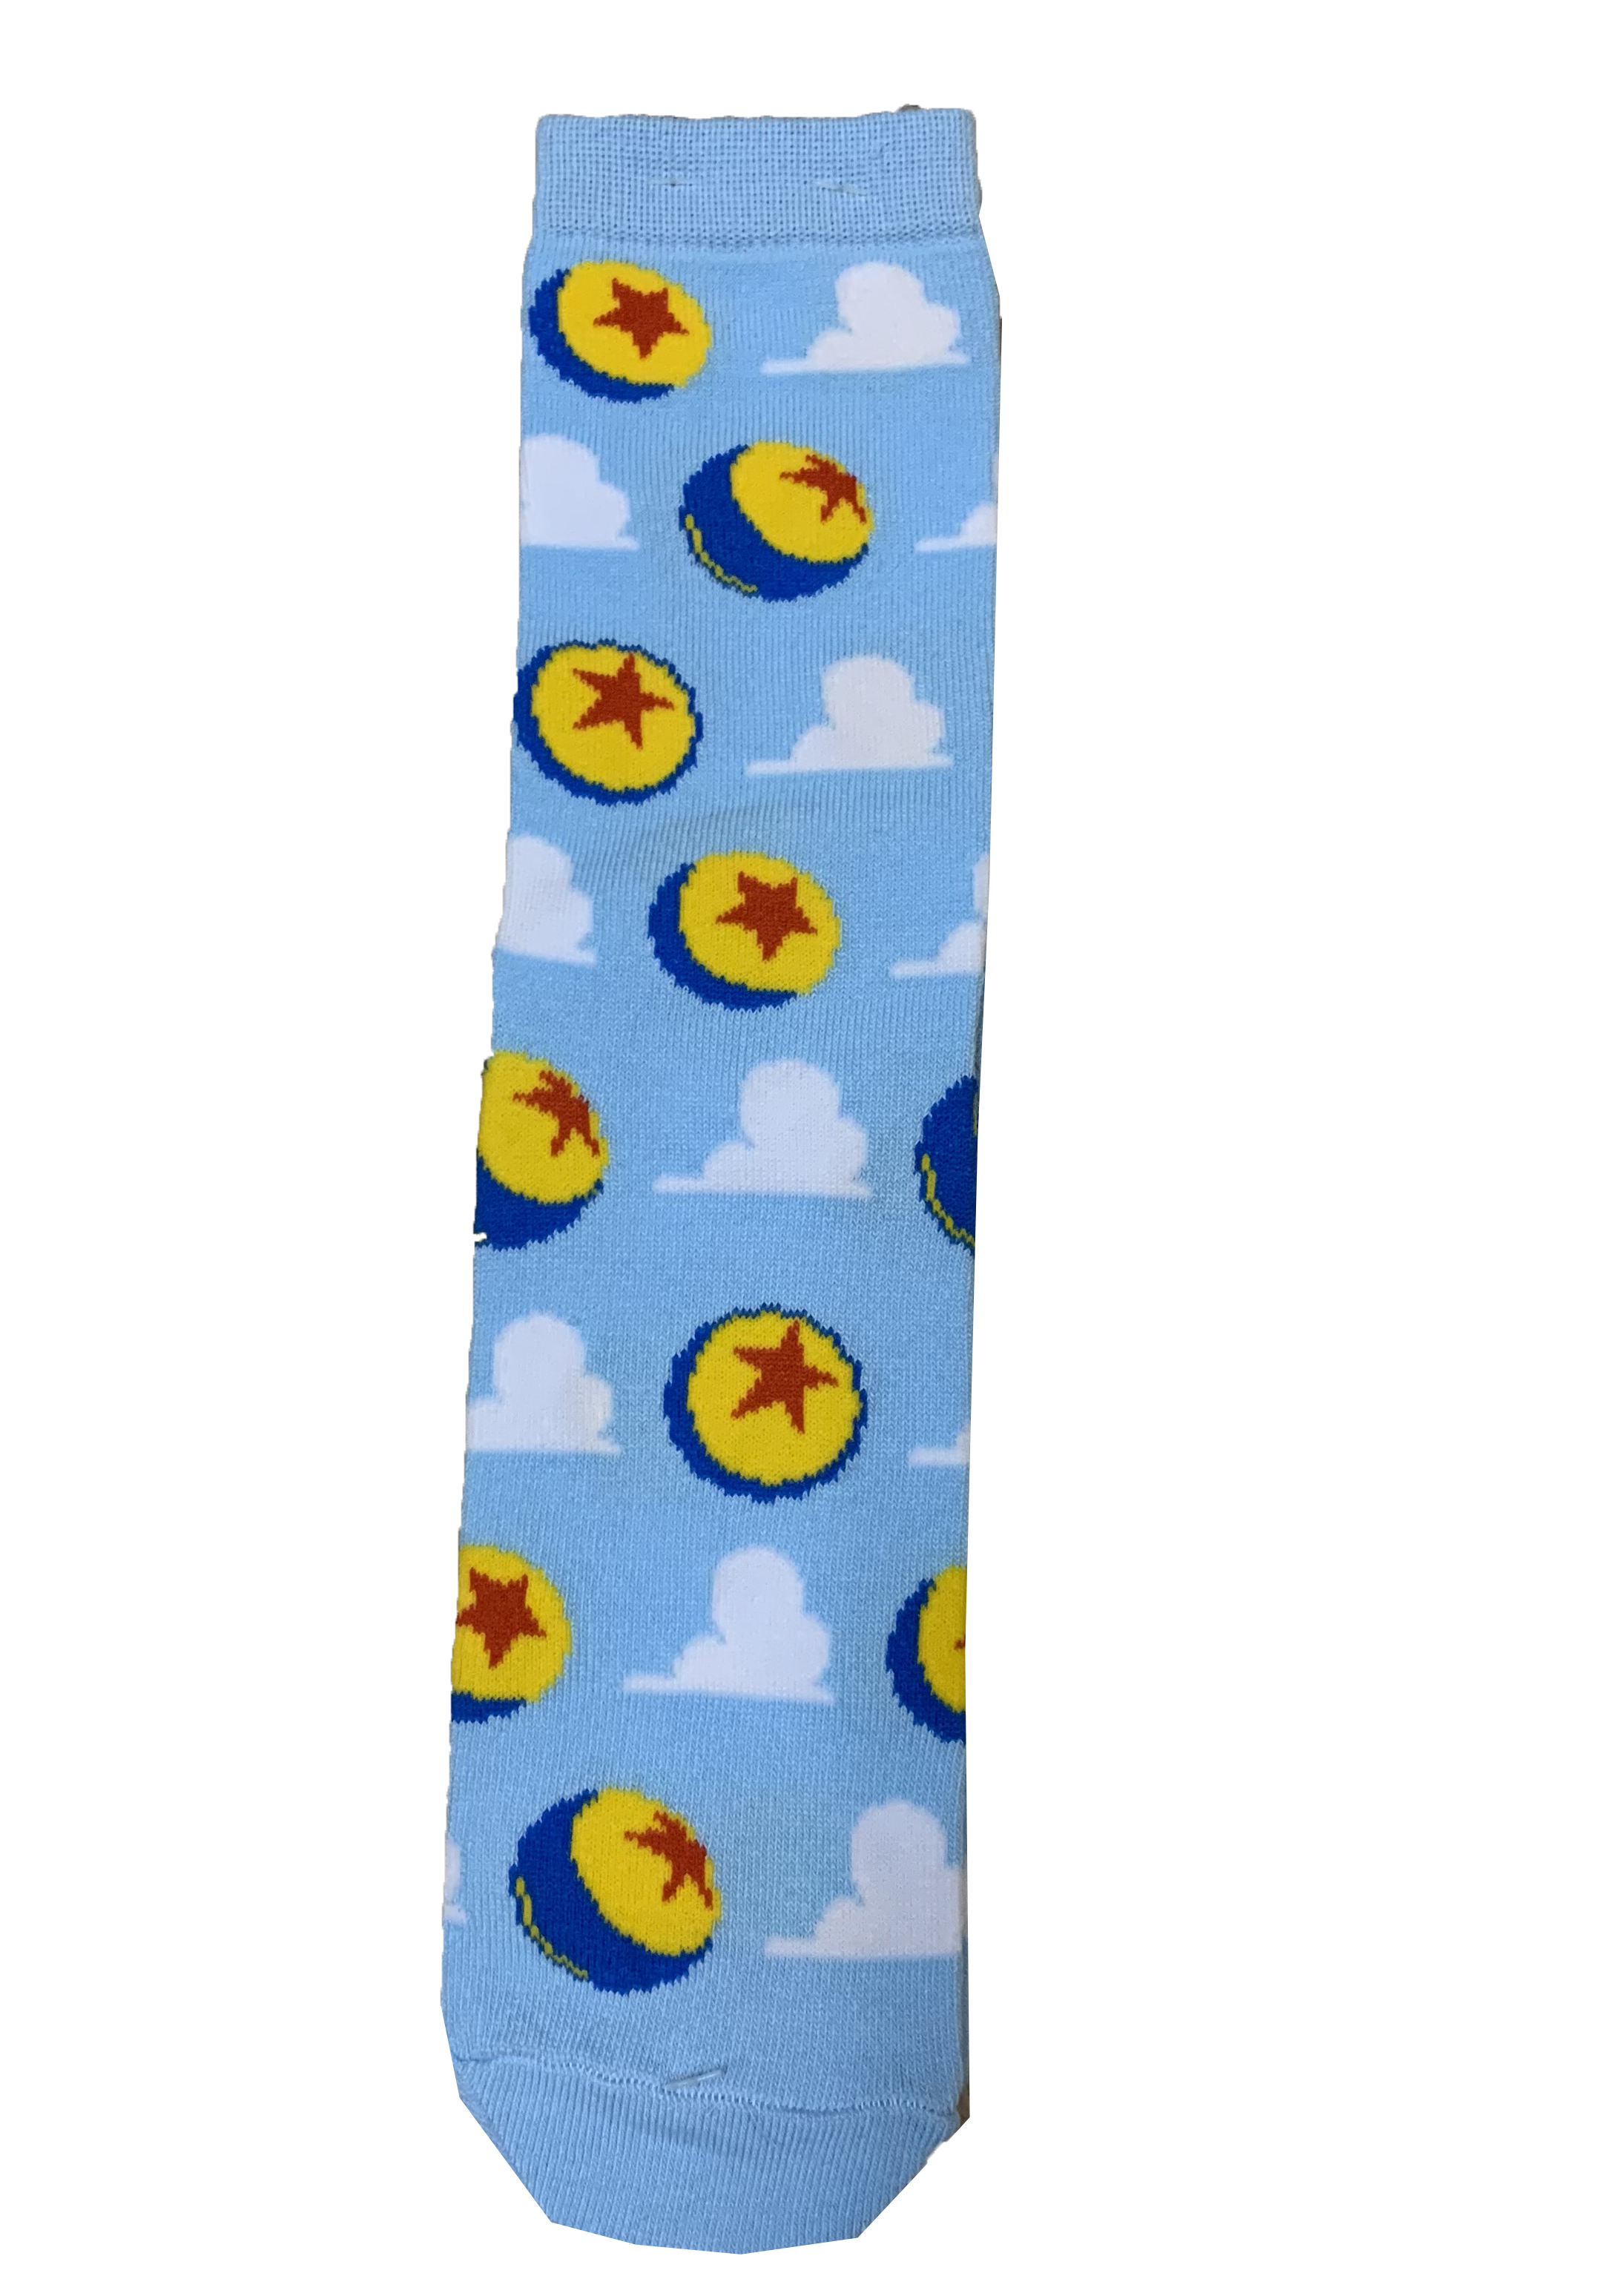 disney socks for adults pixar ball